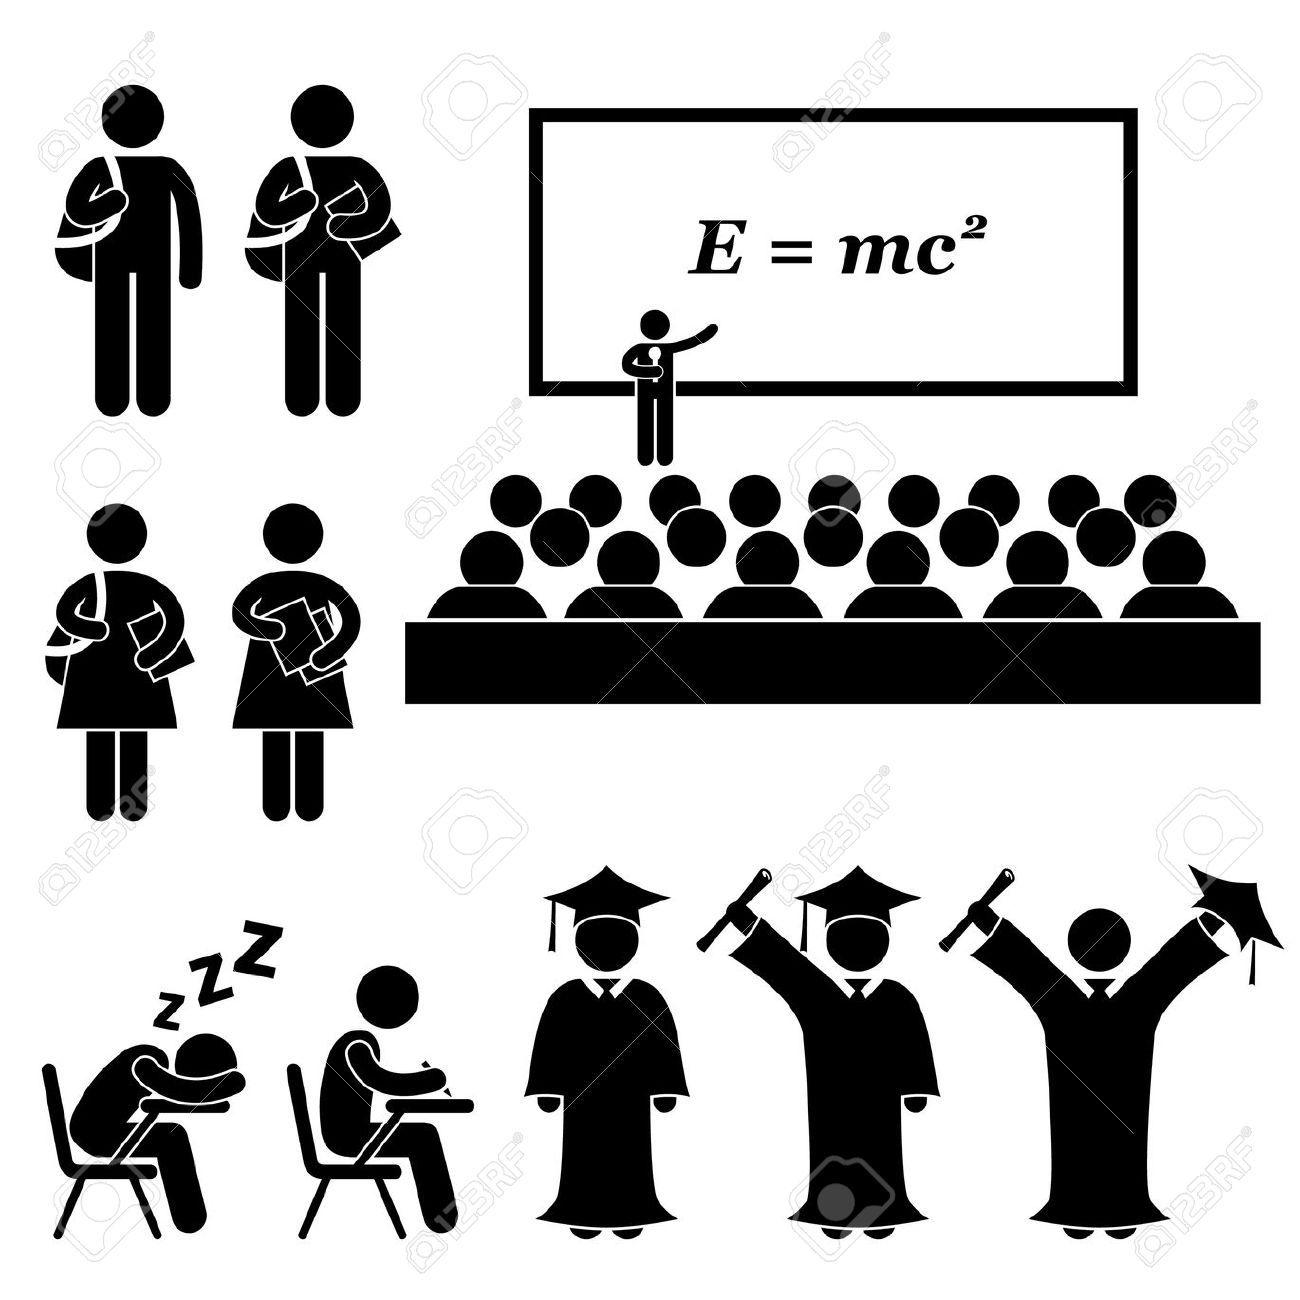 classroom pictogram Google 검색 Pictogram, Stick figures